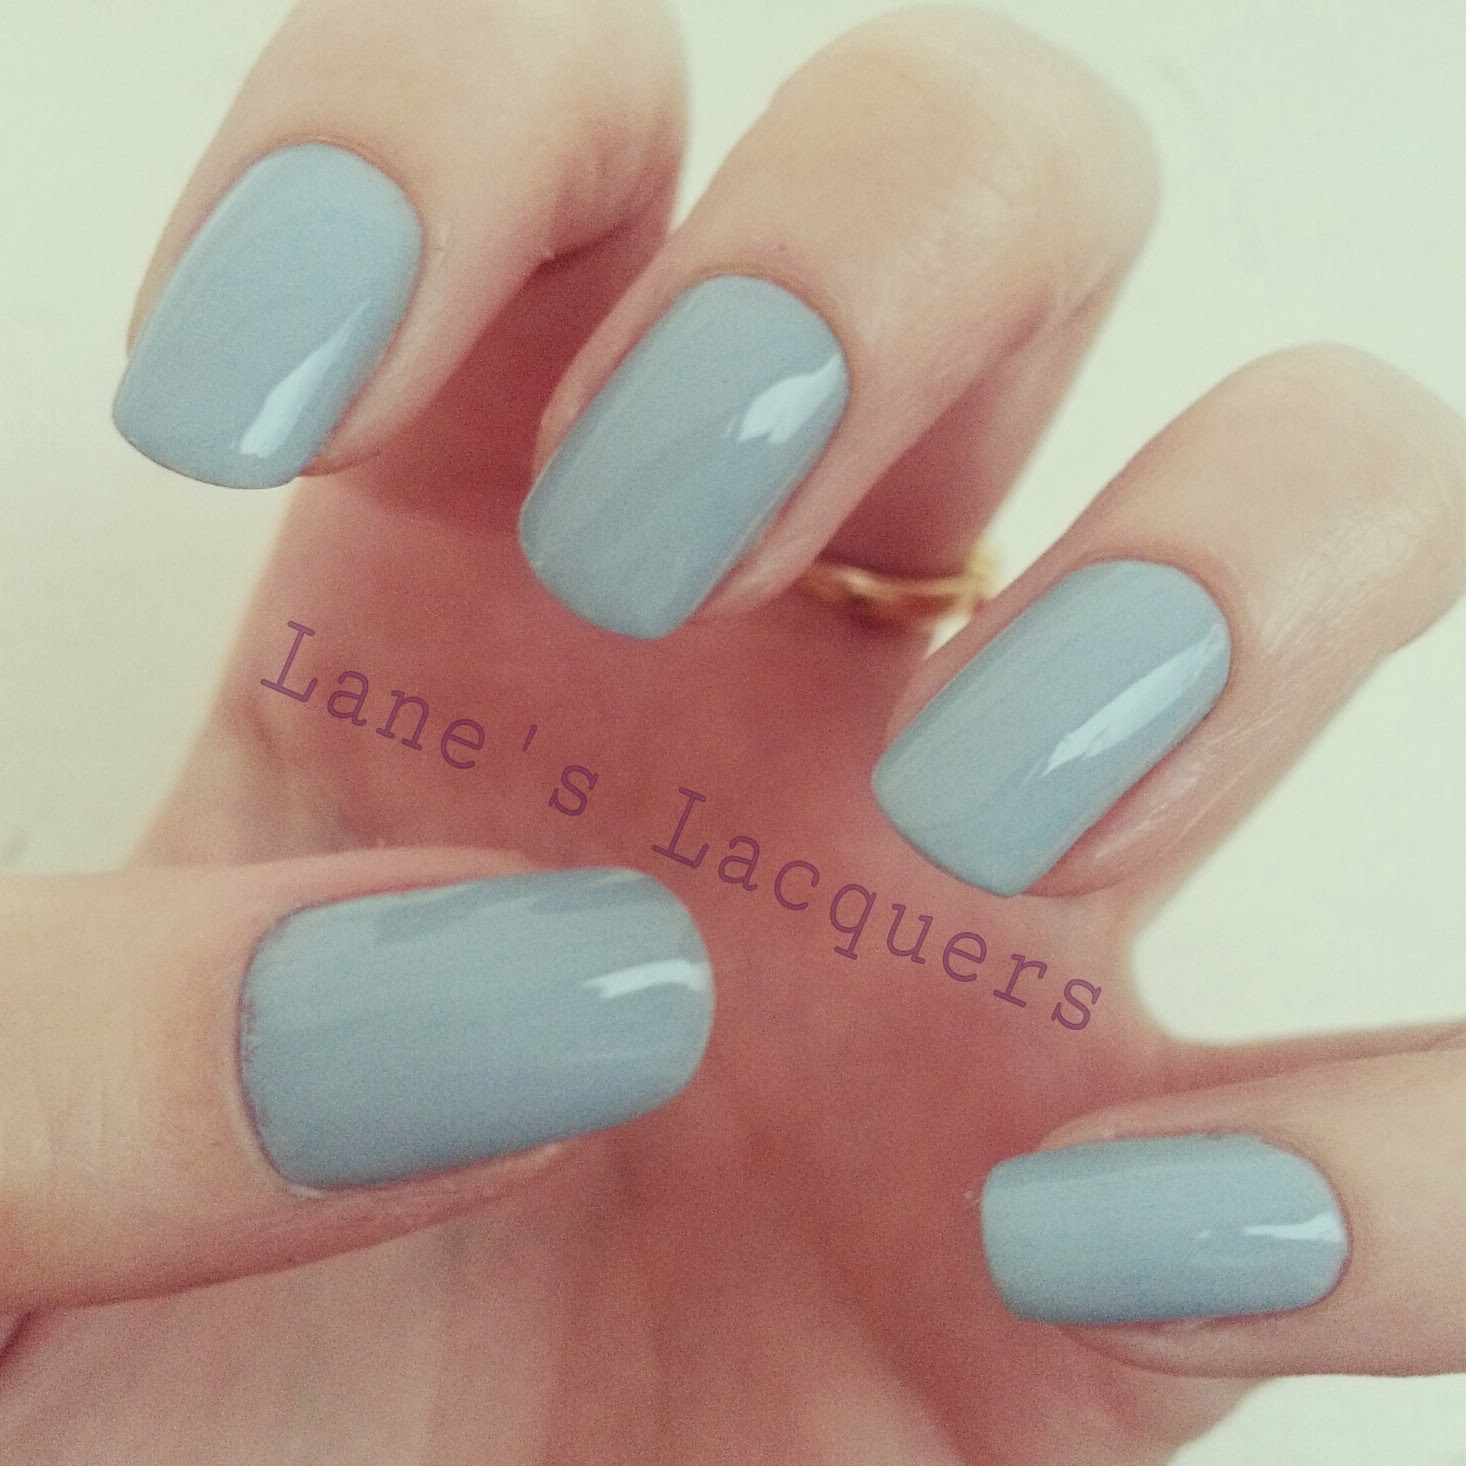 nails-inc-sheraton-street-swatch-manicure